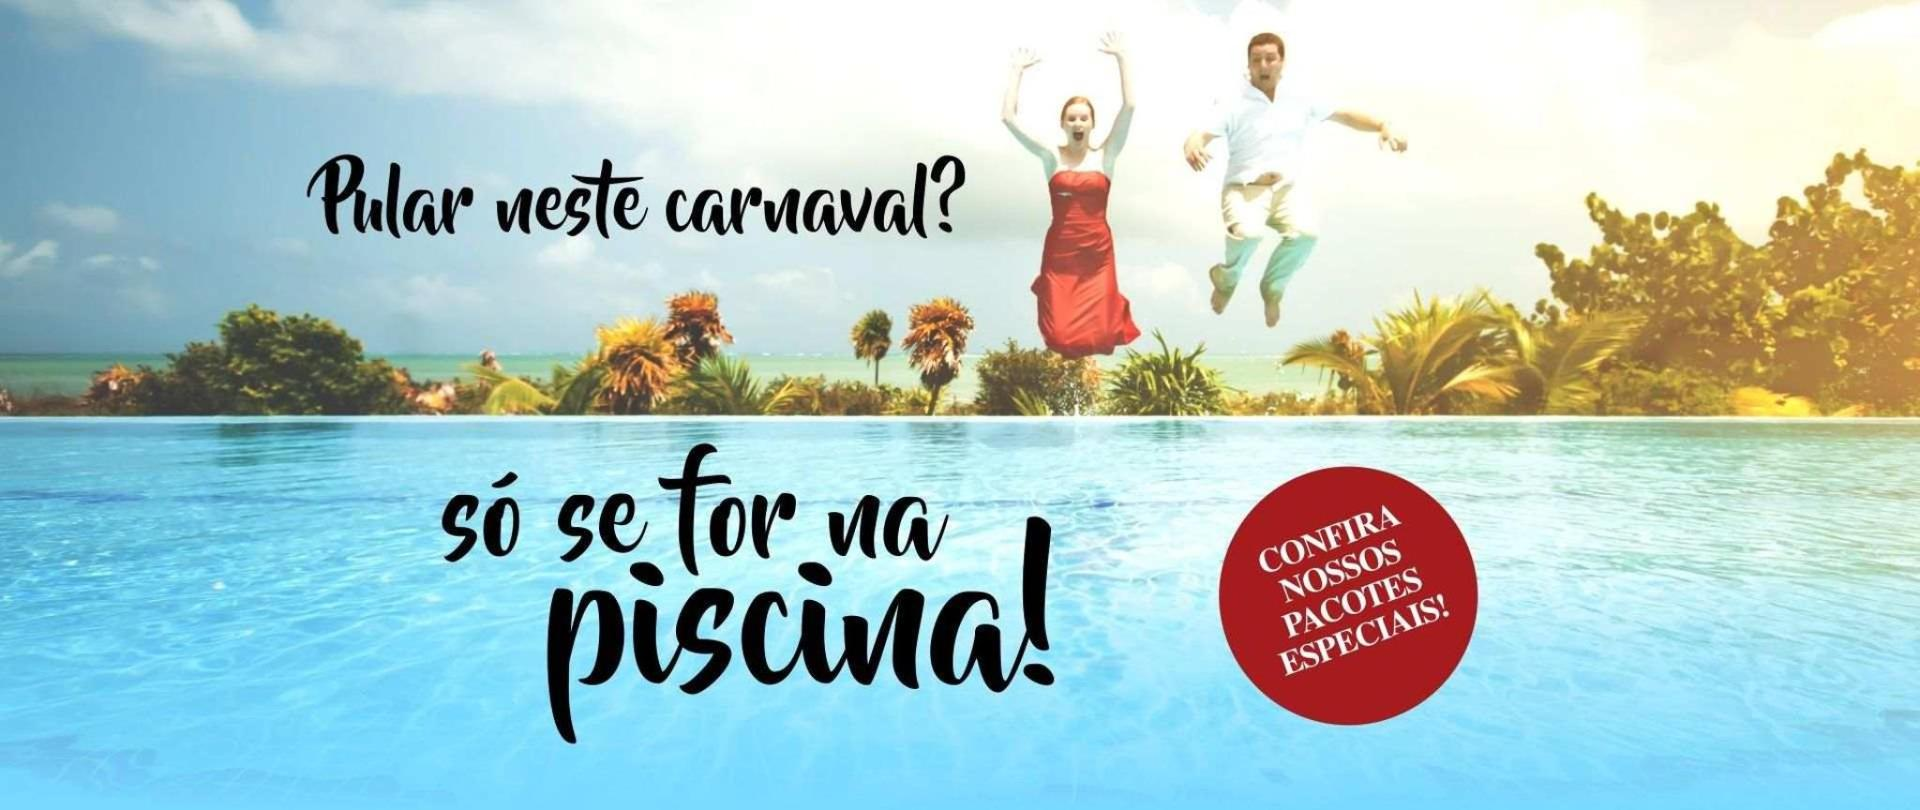 san_campanha-de-carnaval_banner.jpg